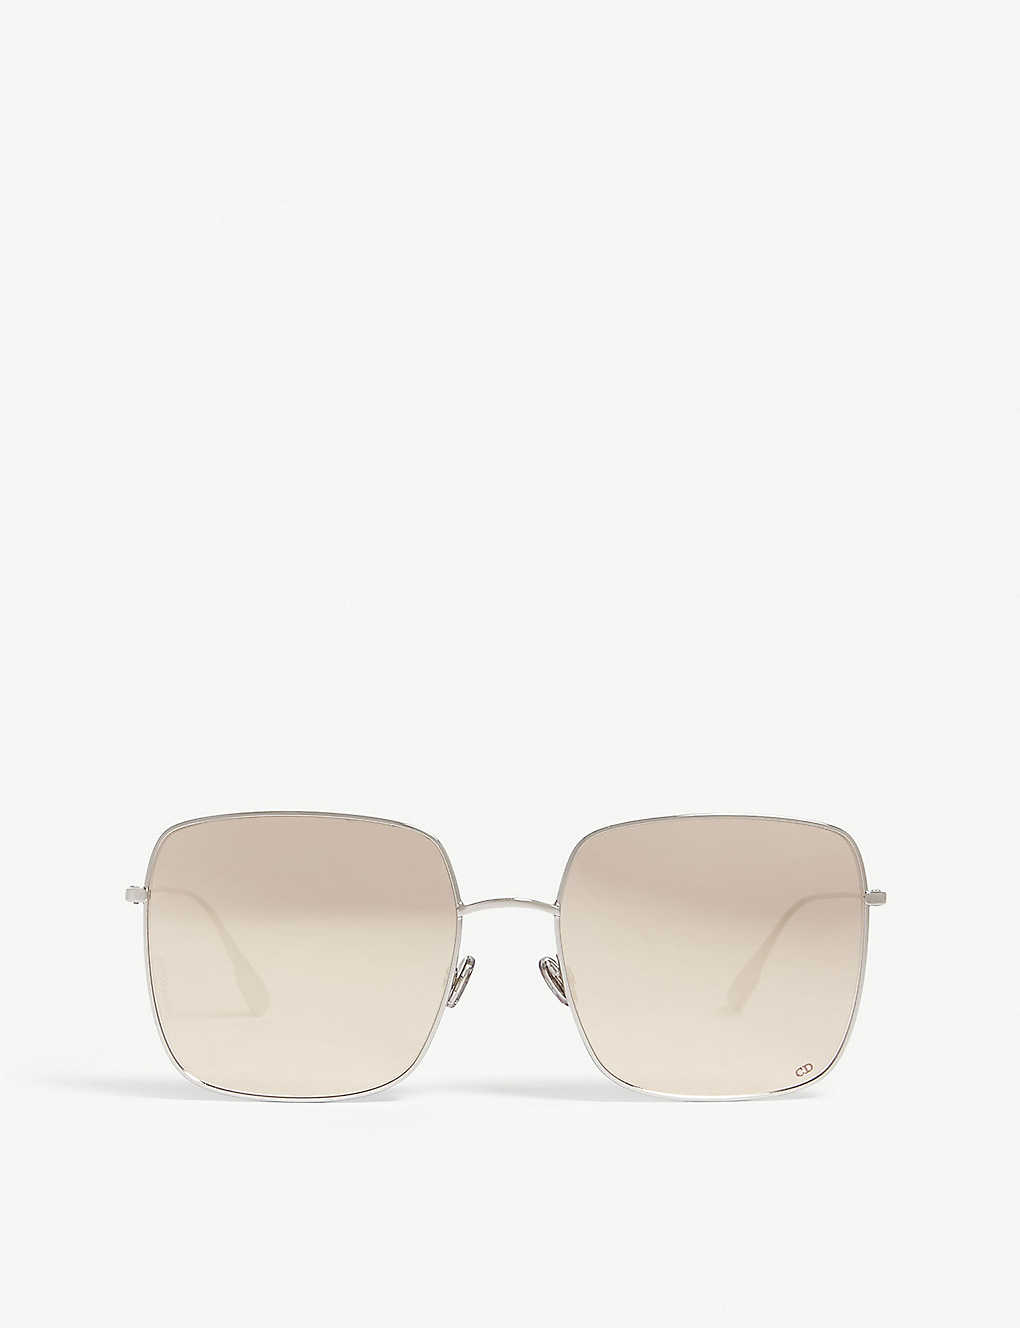 339a1f784f47 DIOR - Stellaire 1 sunglasses | Selfridges.com